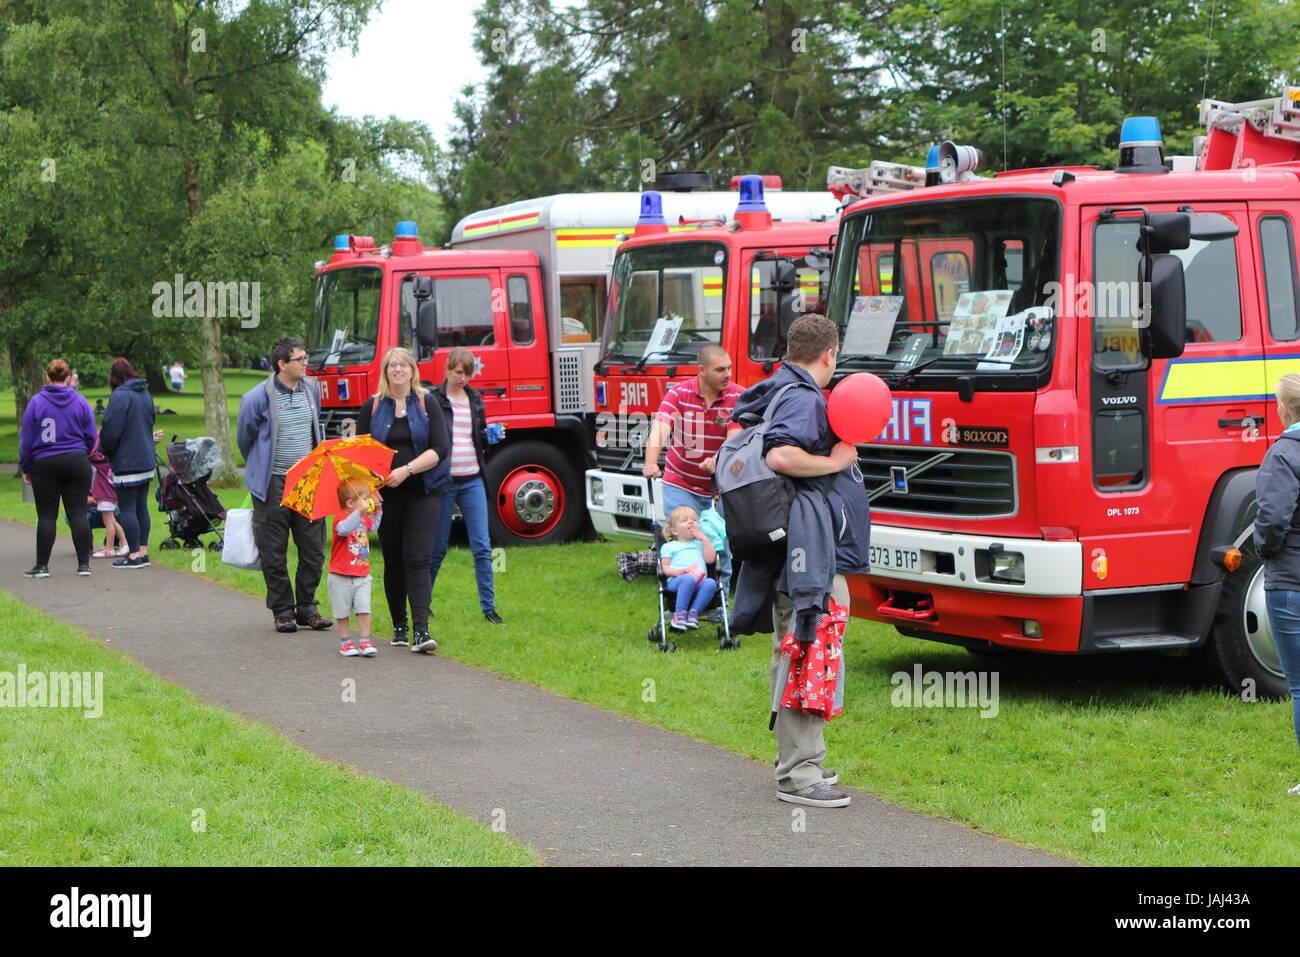 Beaulieu, Hampshire, UK - 29. Mai 2017: Feuer Besucher betrachten Vintage Motoren im Jahr 2017 999 zeigen an das Stockbild